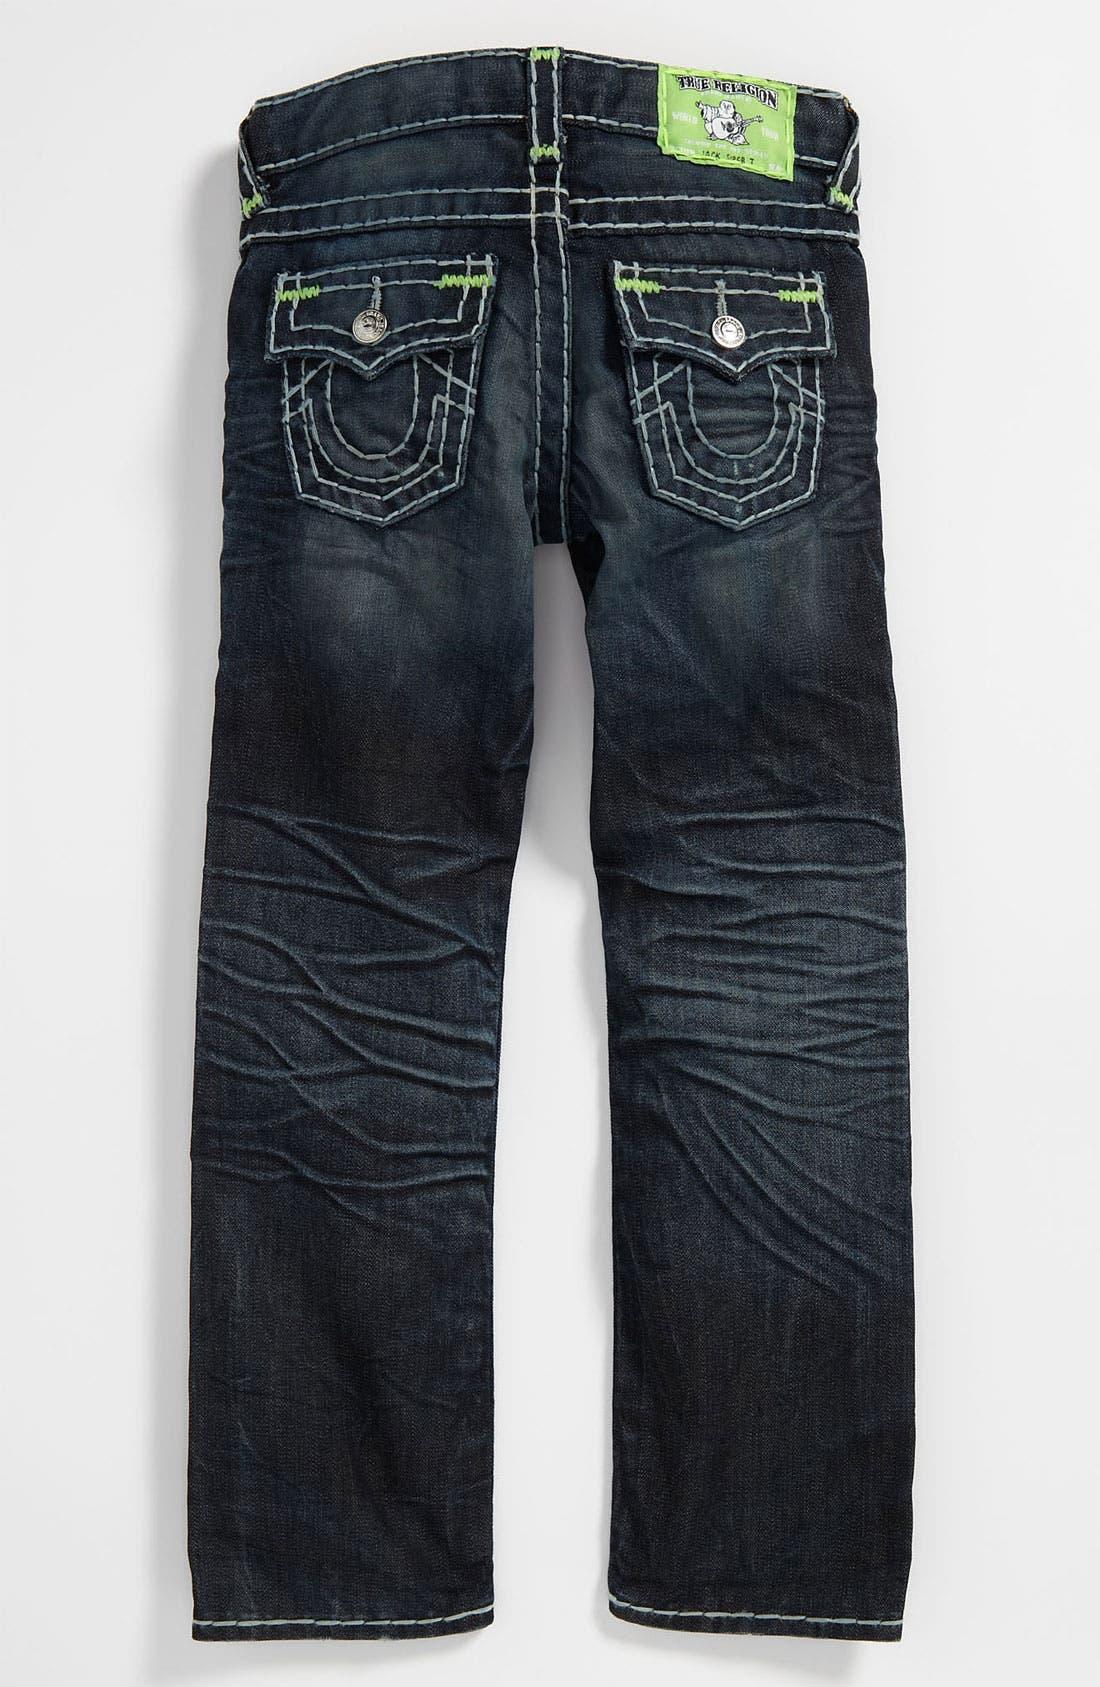 Main Image - True Religion Brand Jeans 'Jack Super T' Jeans (Big Boys)